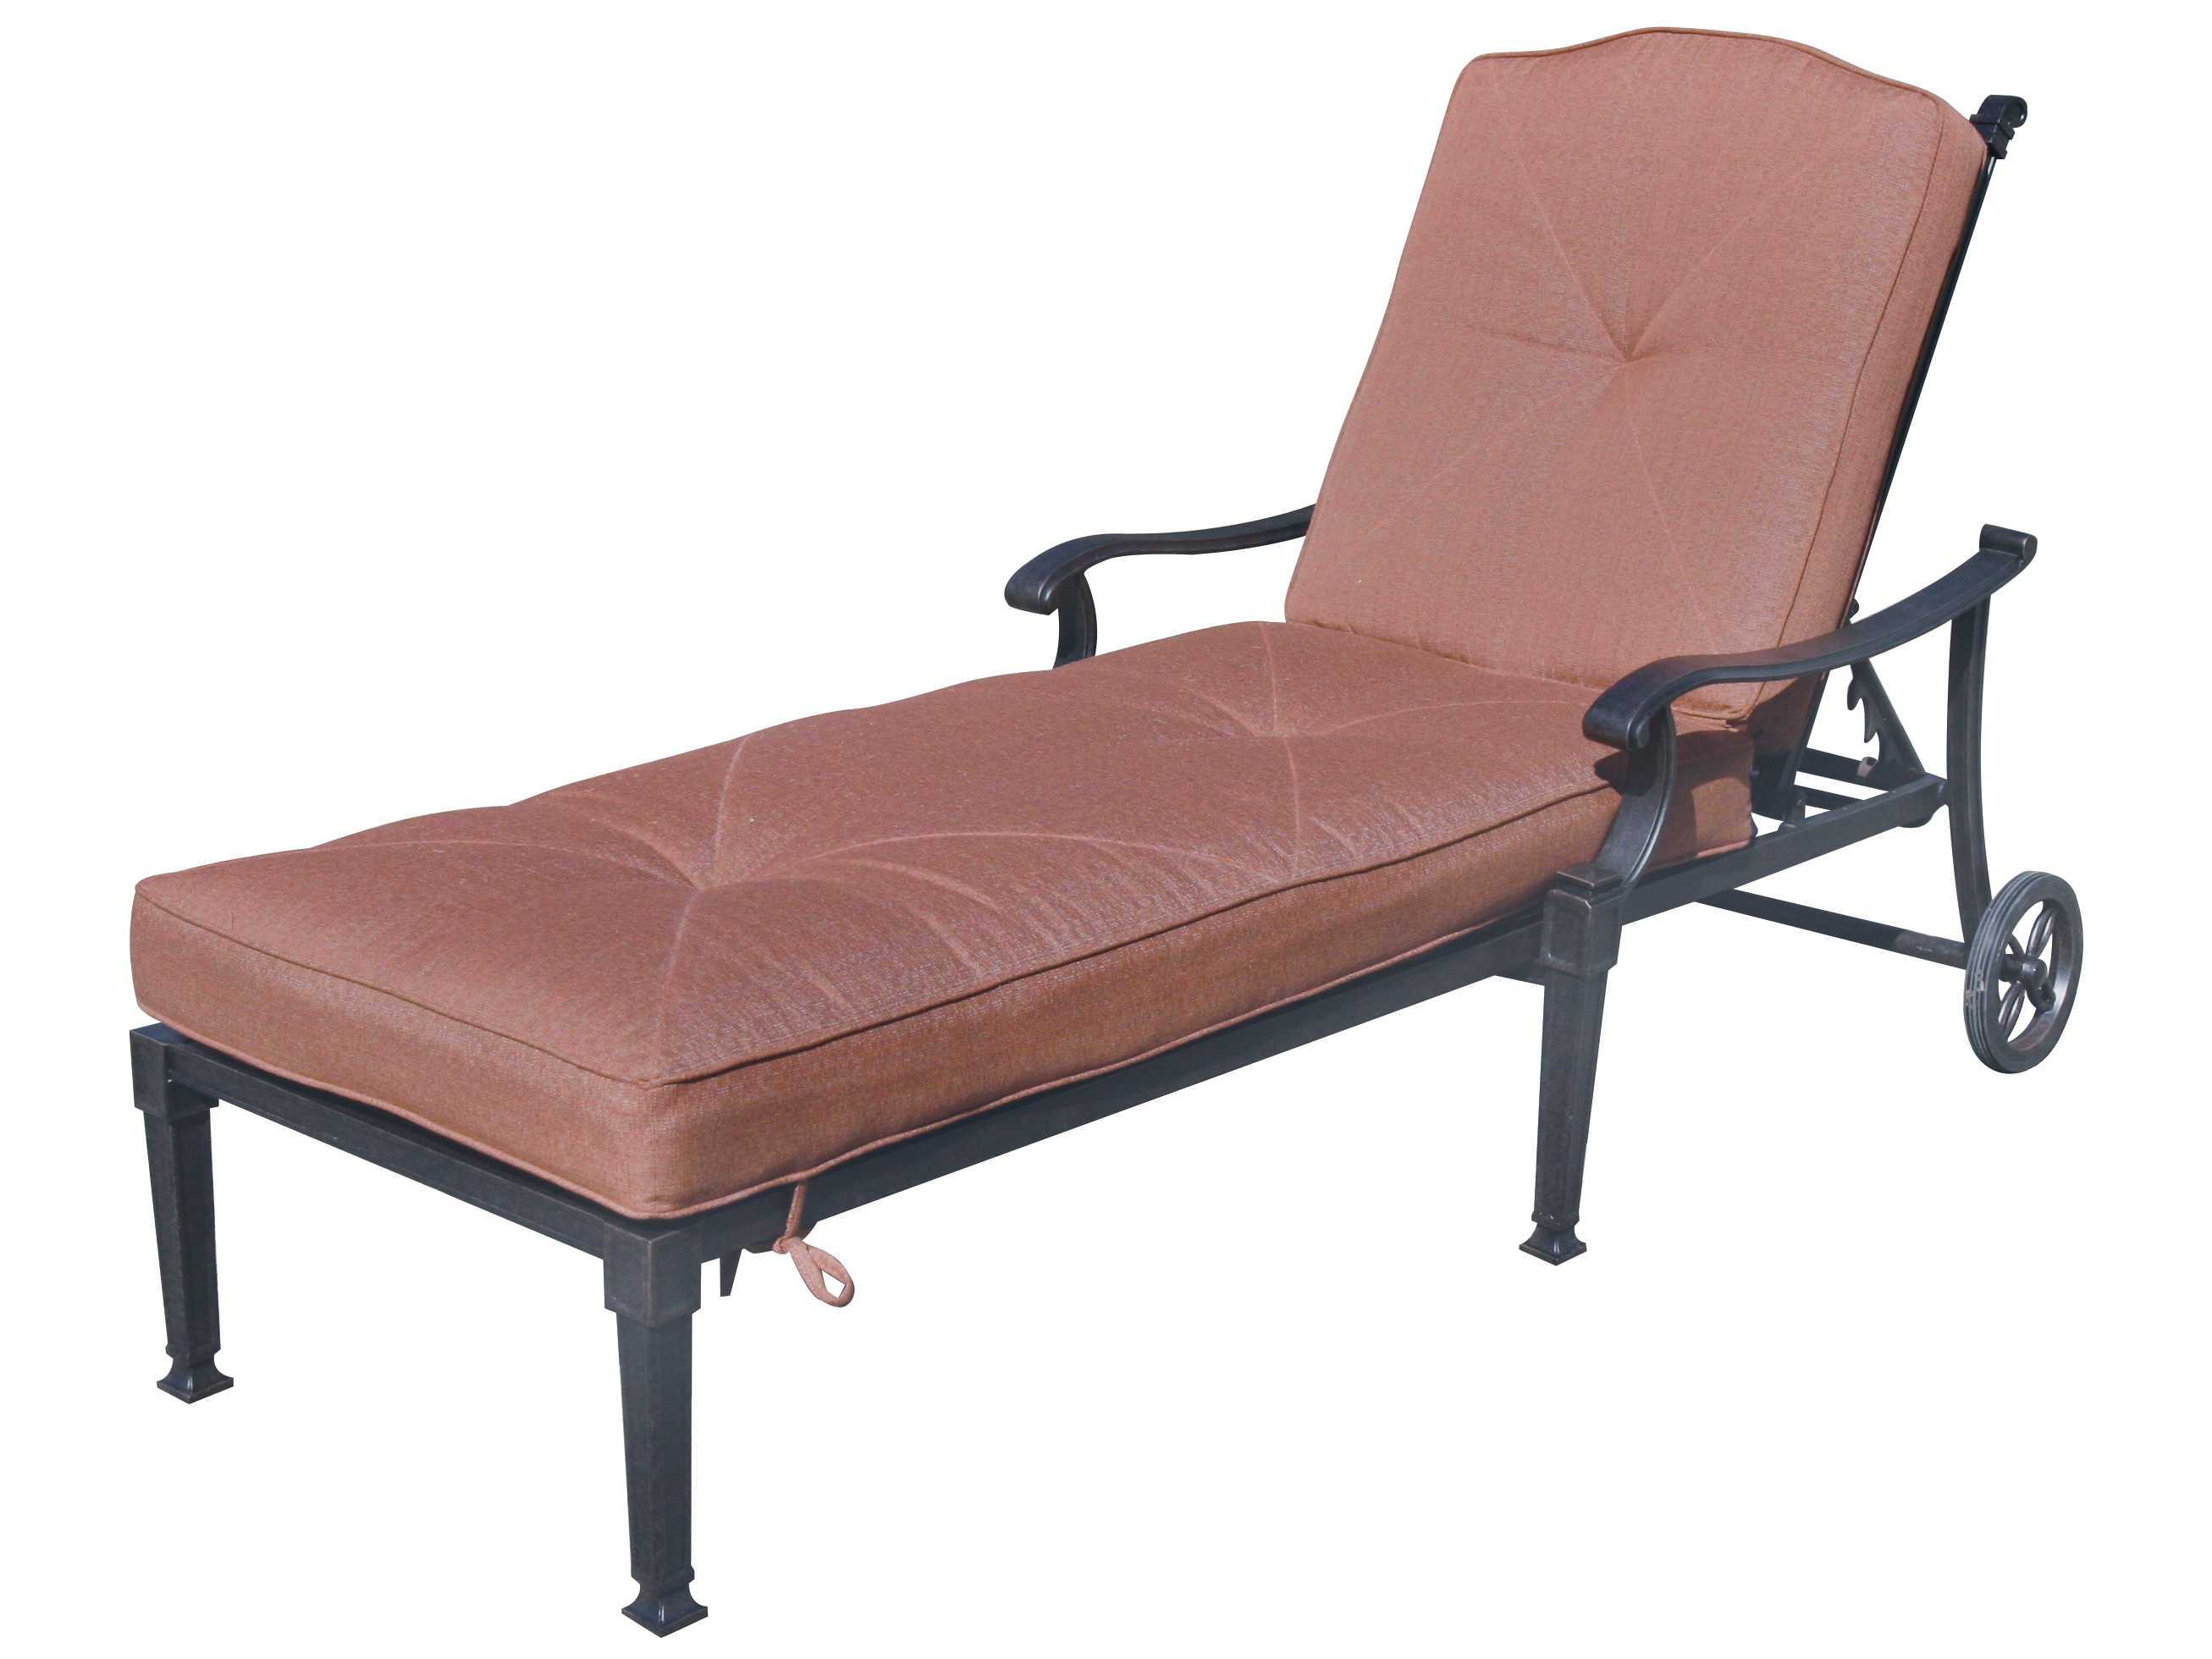 Darlee outdoor living charleston cast aluminum antique for Cast aluminum outdoor chaise lounge